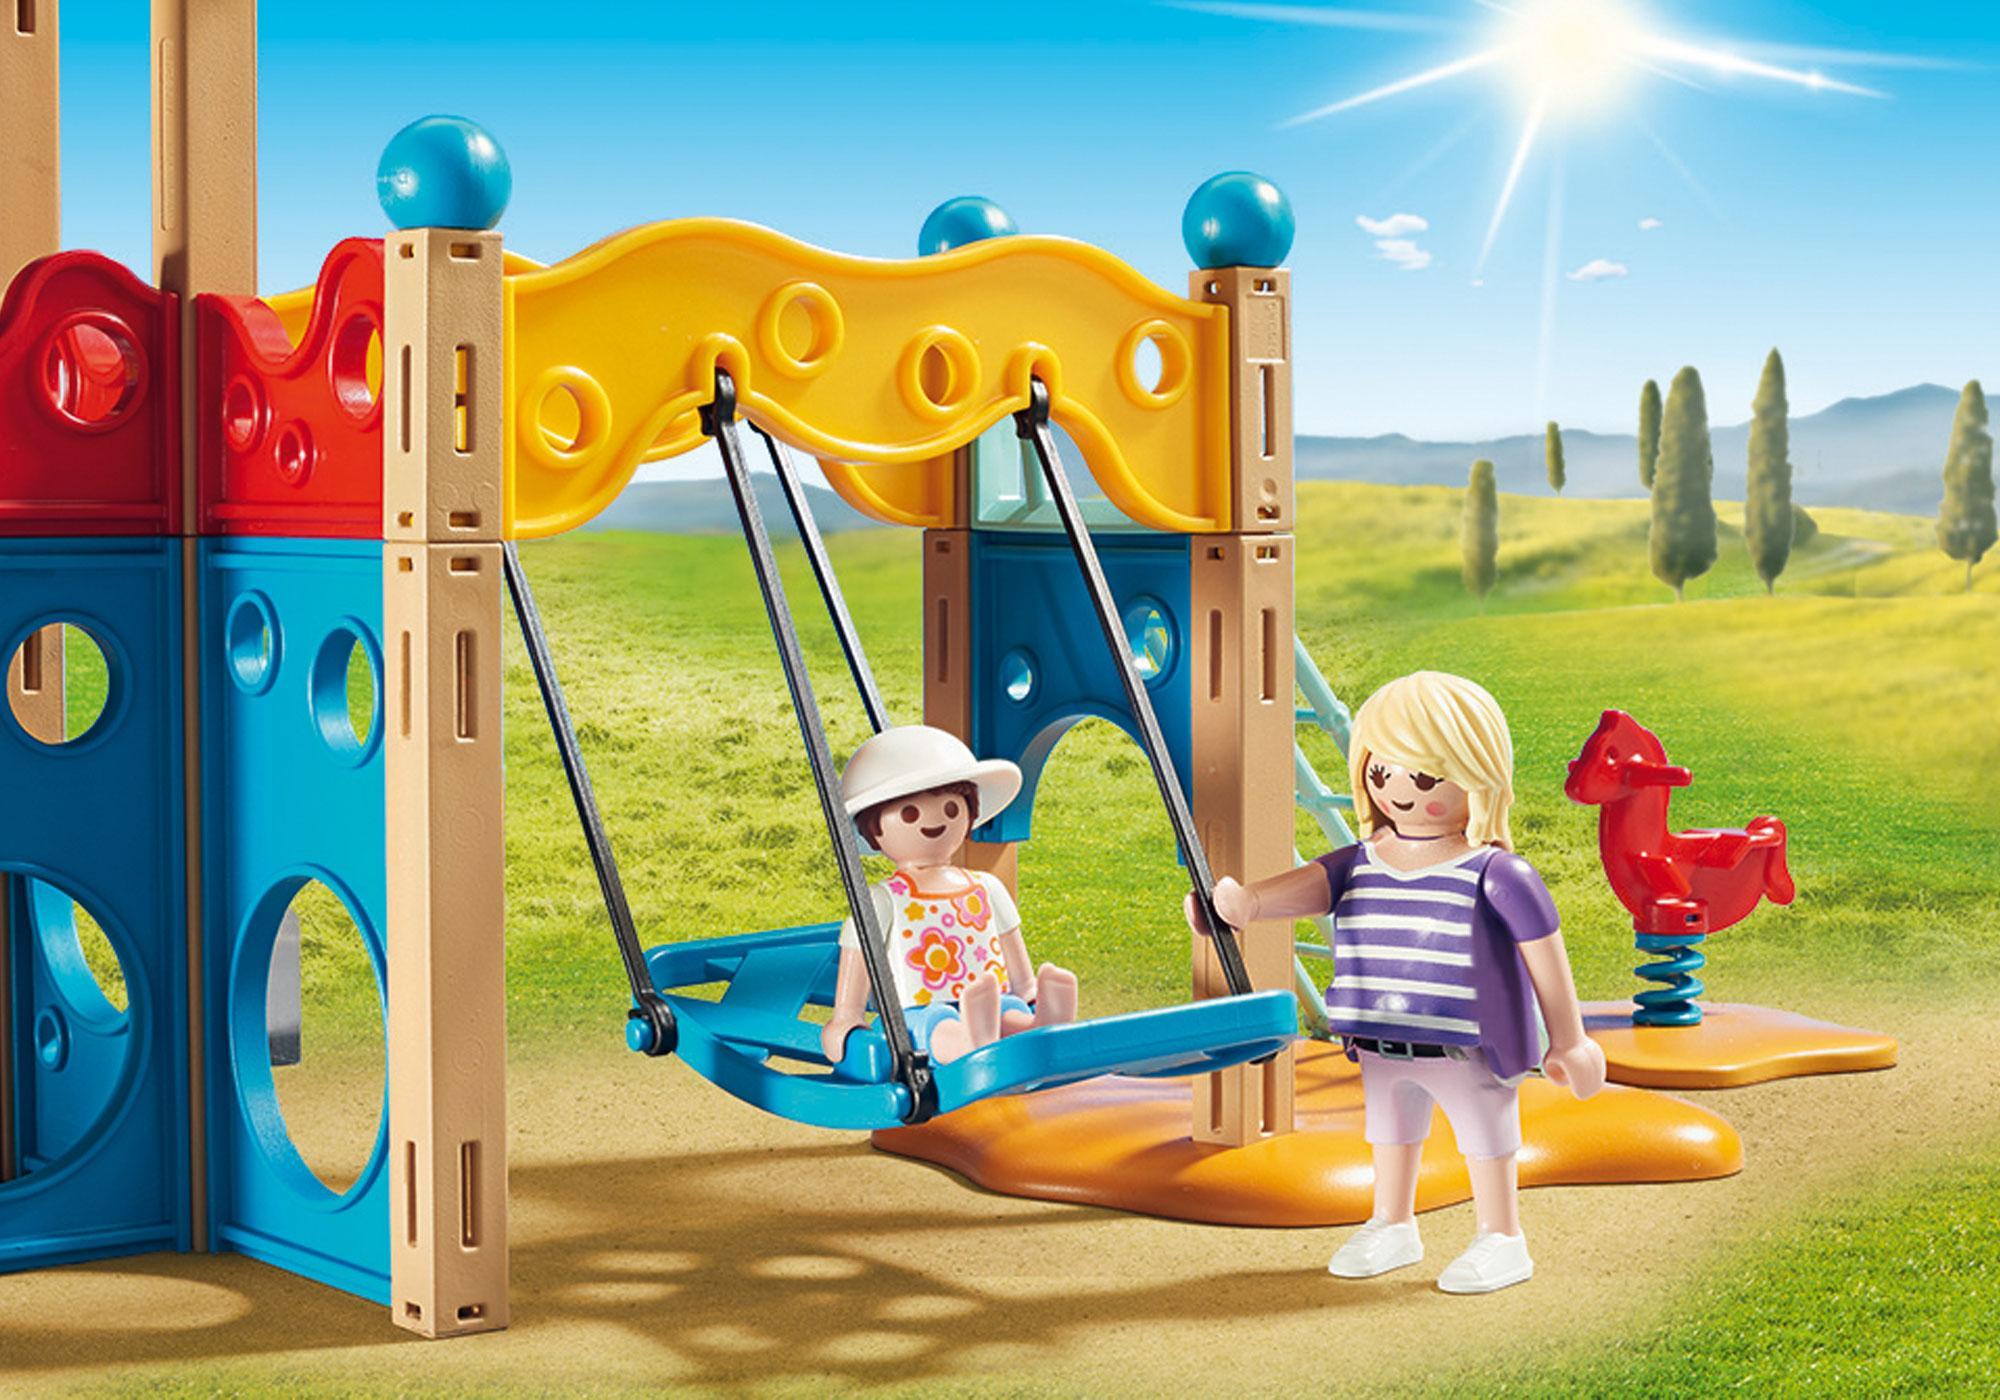 http://media.playmobil.com/i/playmobil/9423_product_extra3/Υπαίθριος παιδότοπος